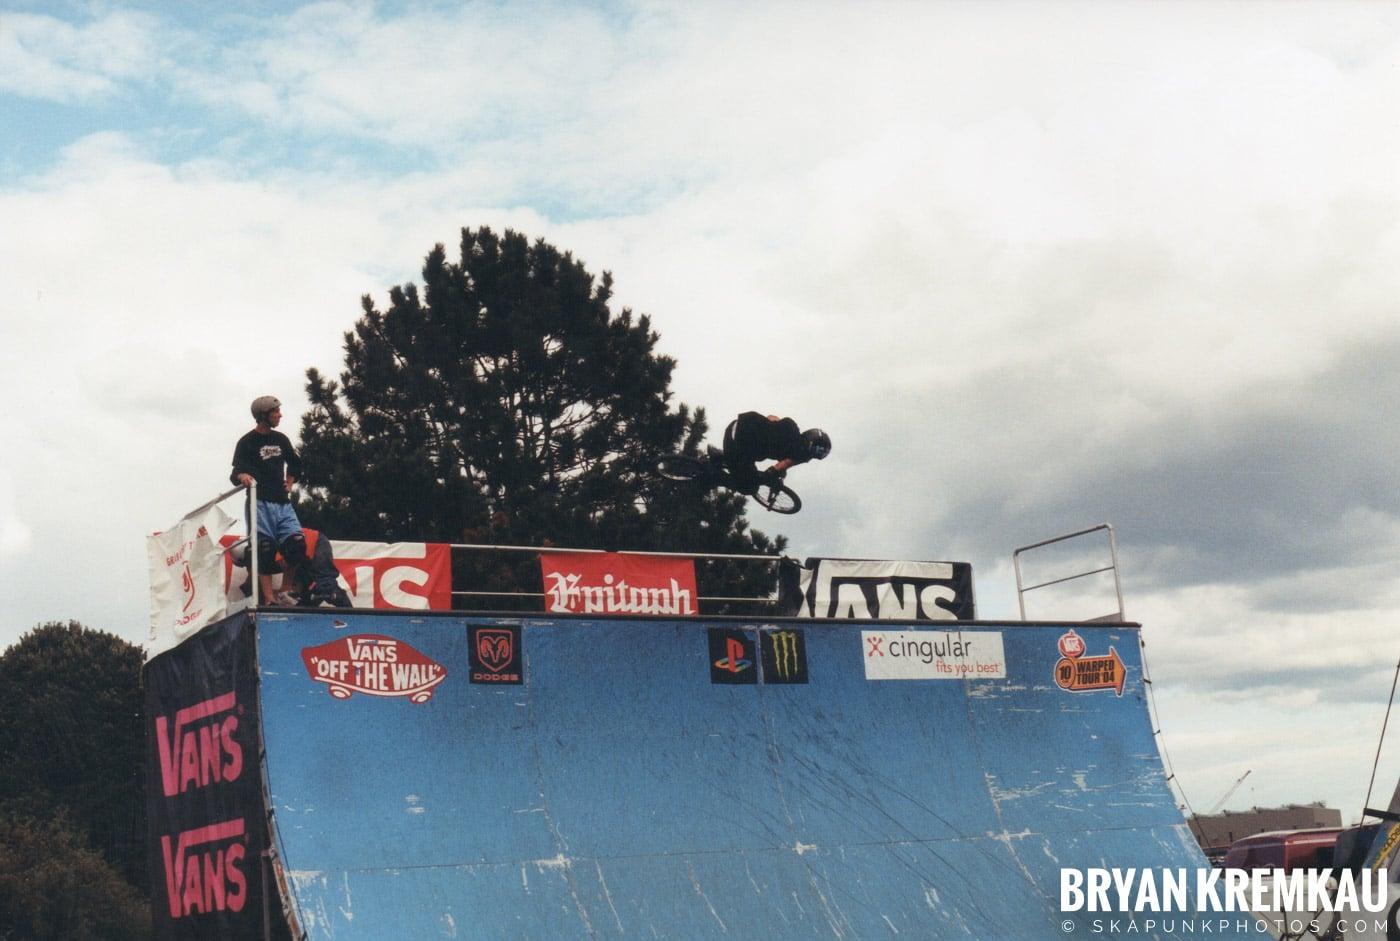 Skaters @ Vans Warped Tour, Randall's Island, NYC - 8.7.04 (7)